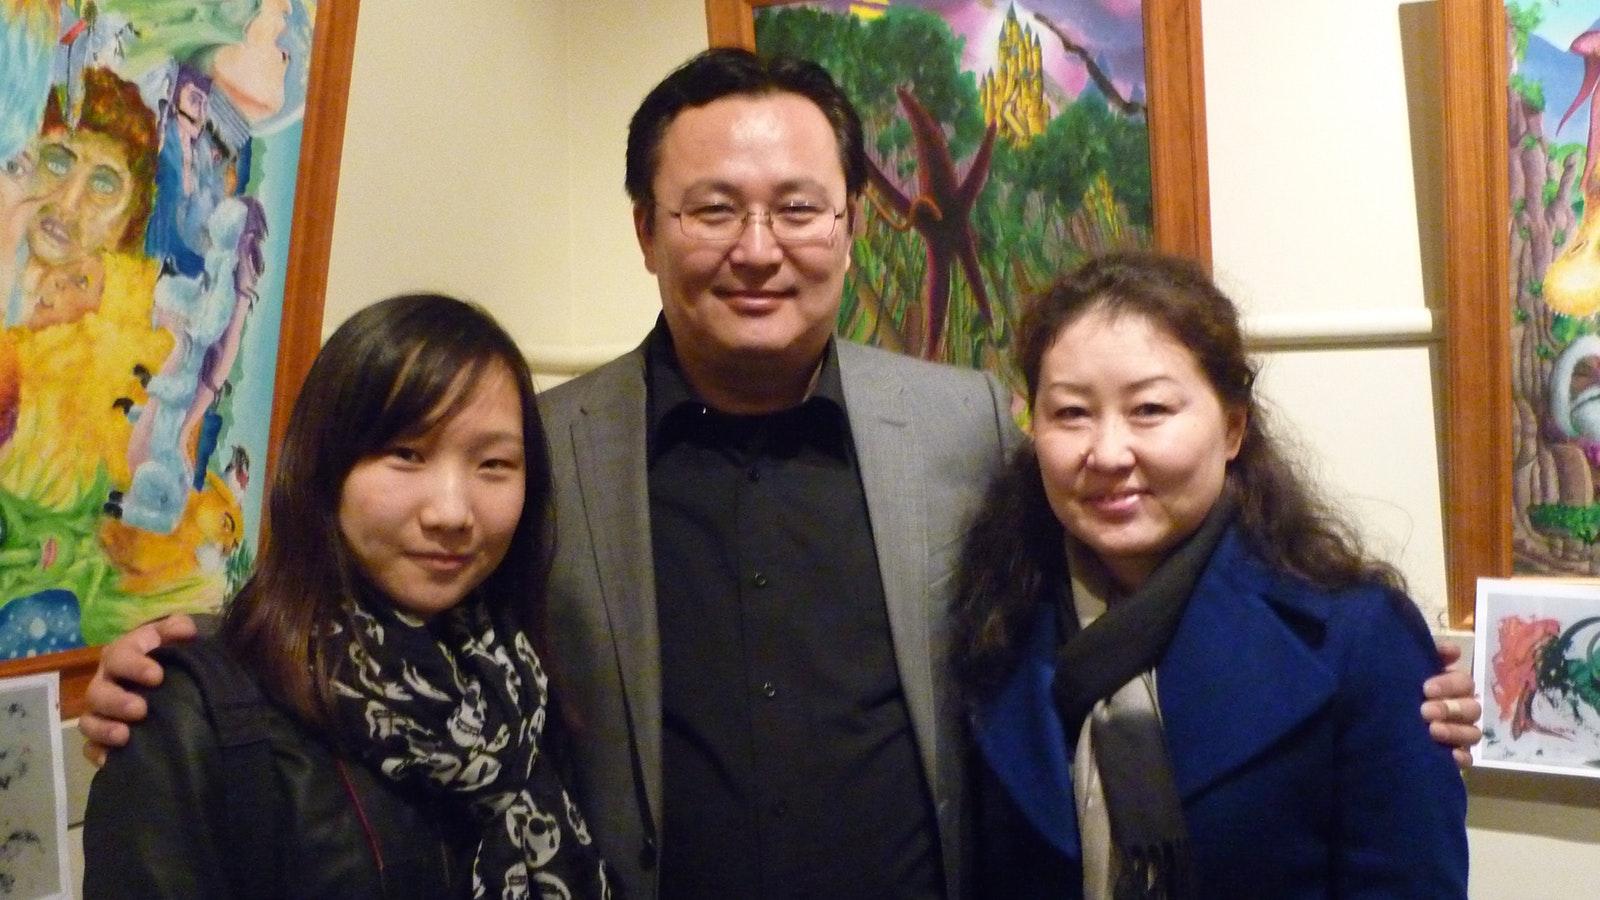 Ariunbold Adiya and Family